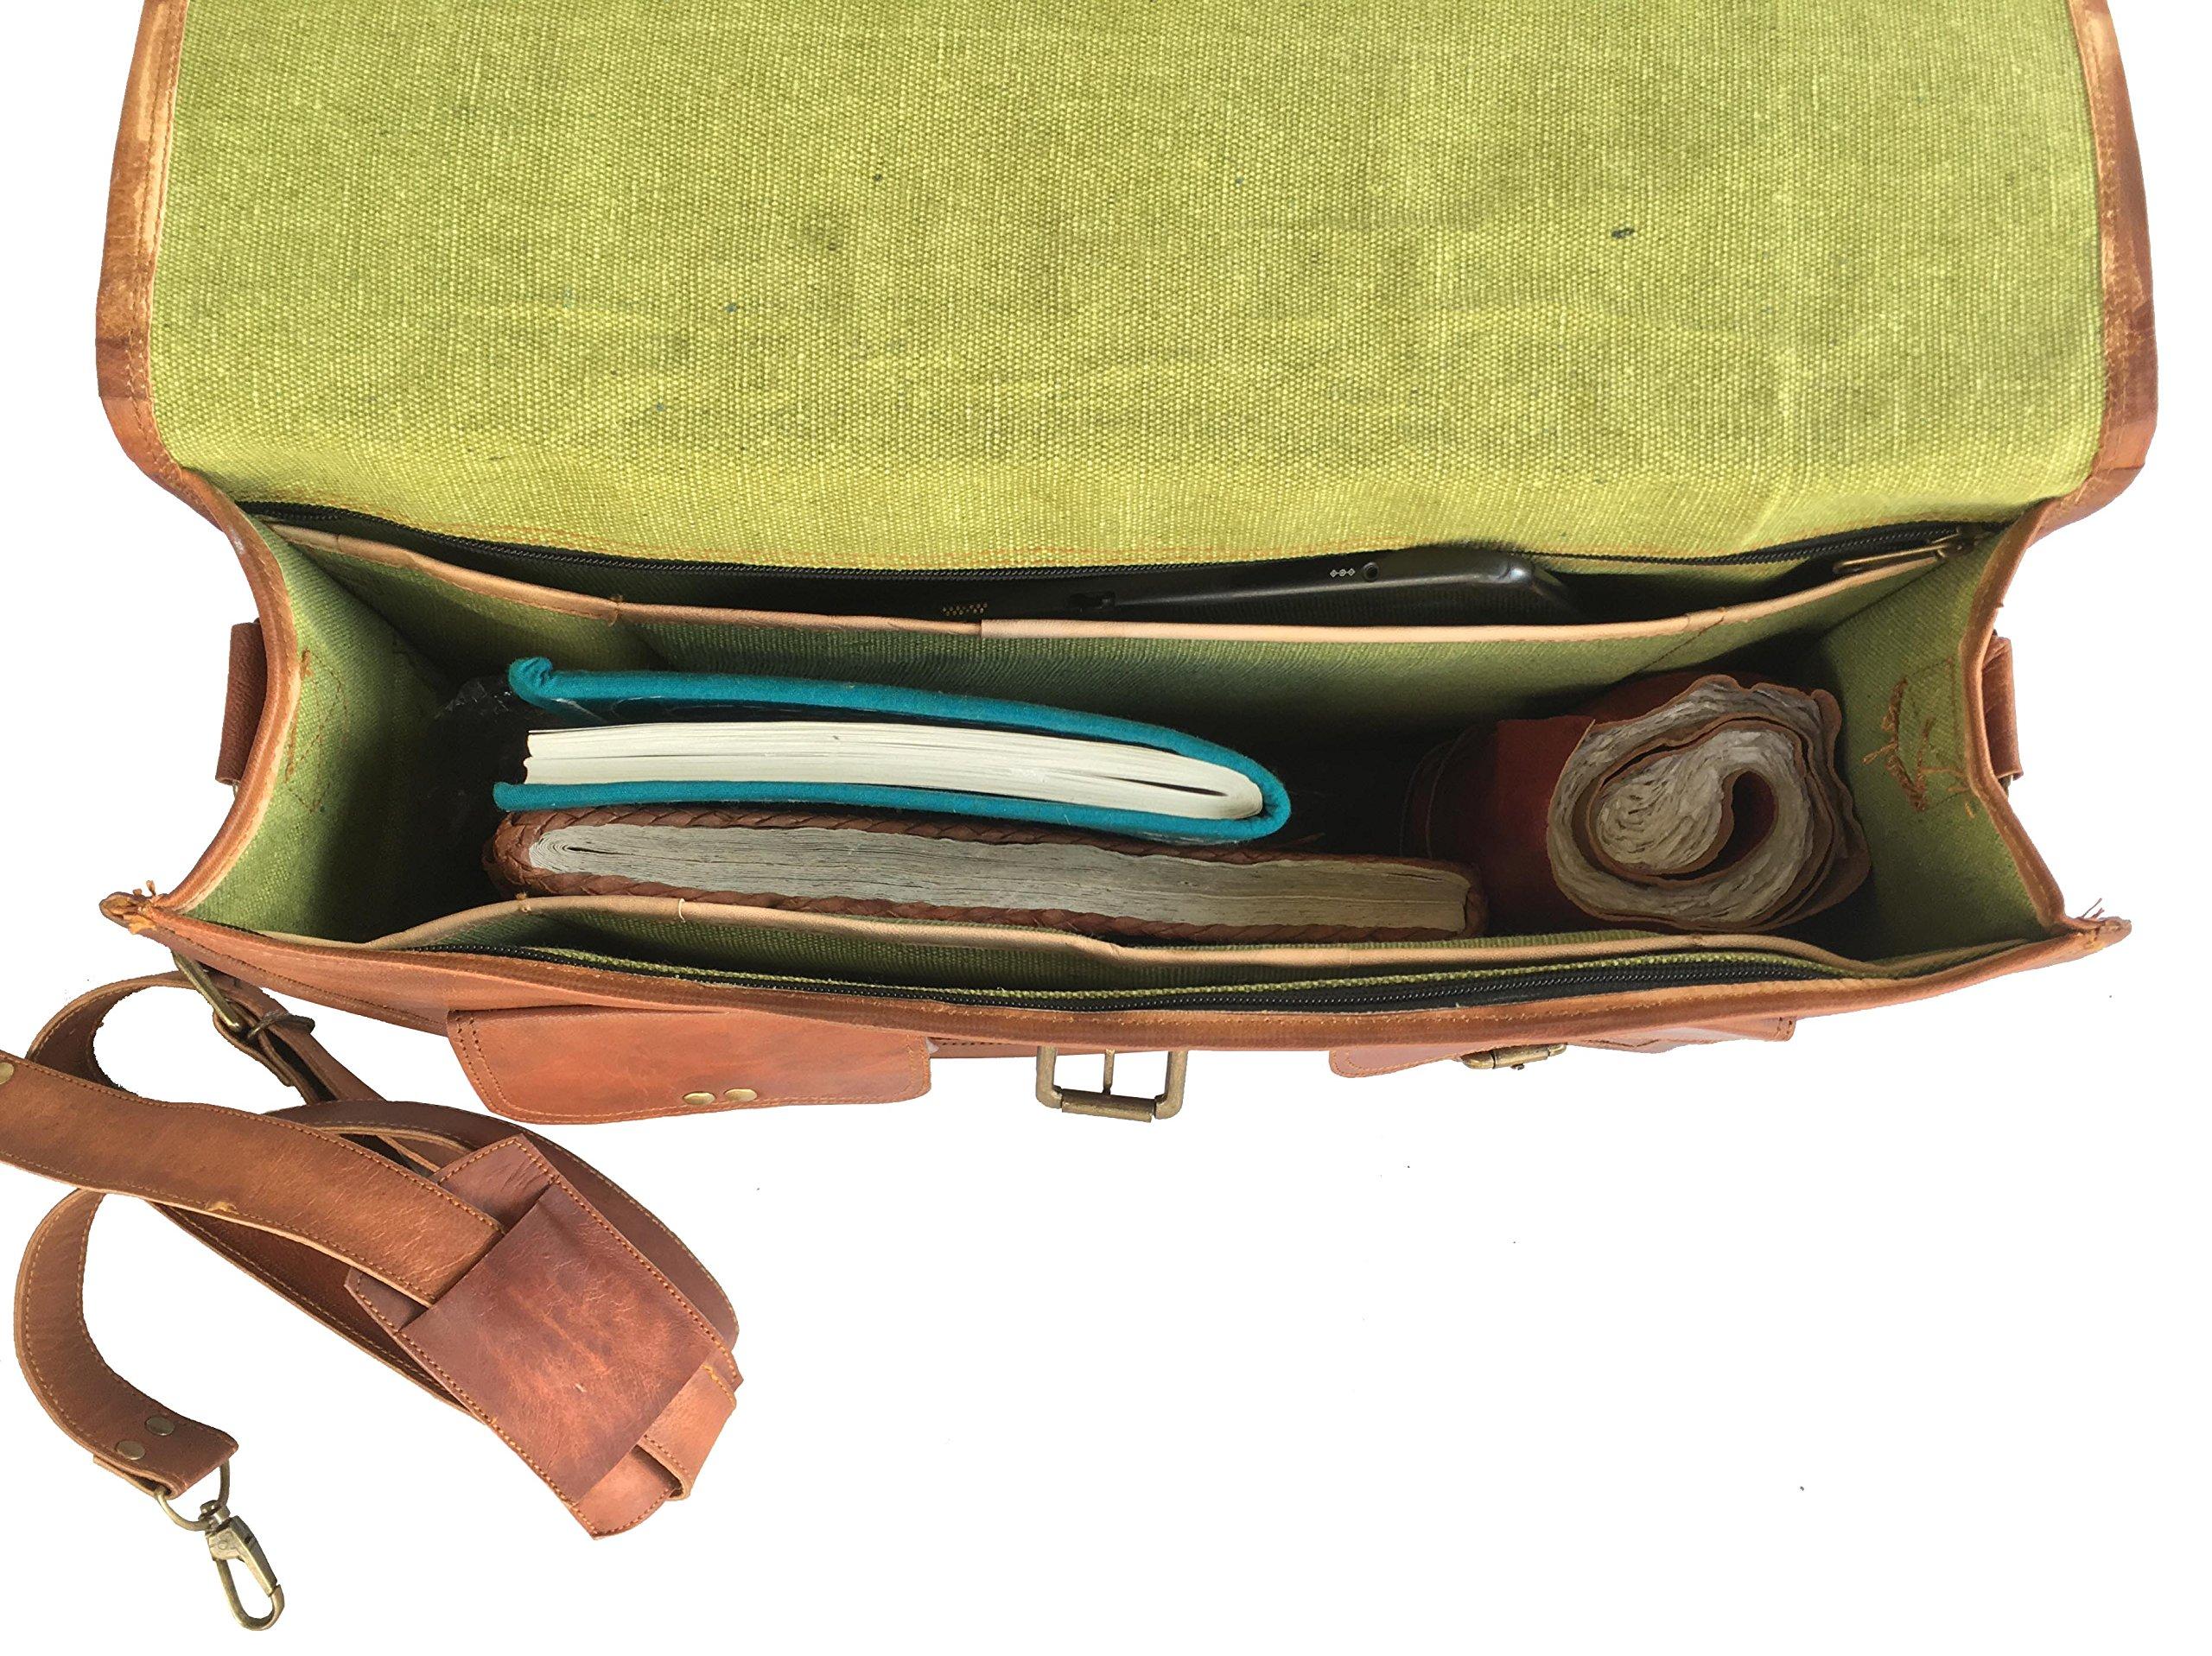 Handolederco 18'' Inches Classic Adult Unisex Cross Shoulder Leather Messenger Laptop Briefcase Bag Satchel Brown